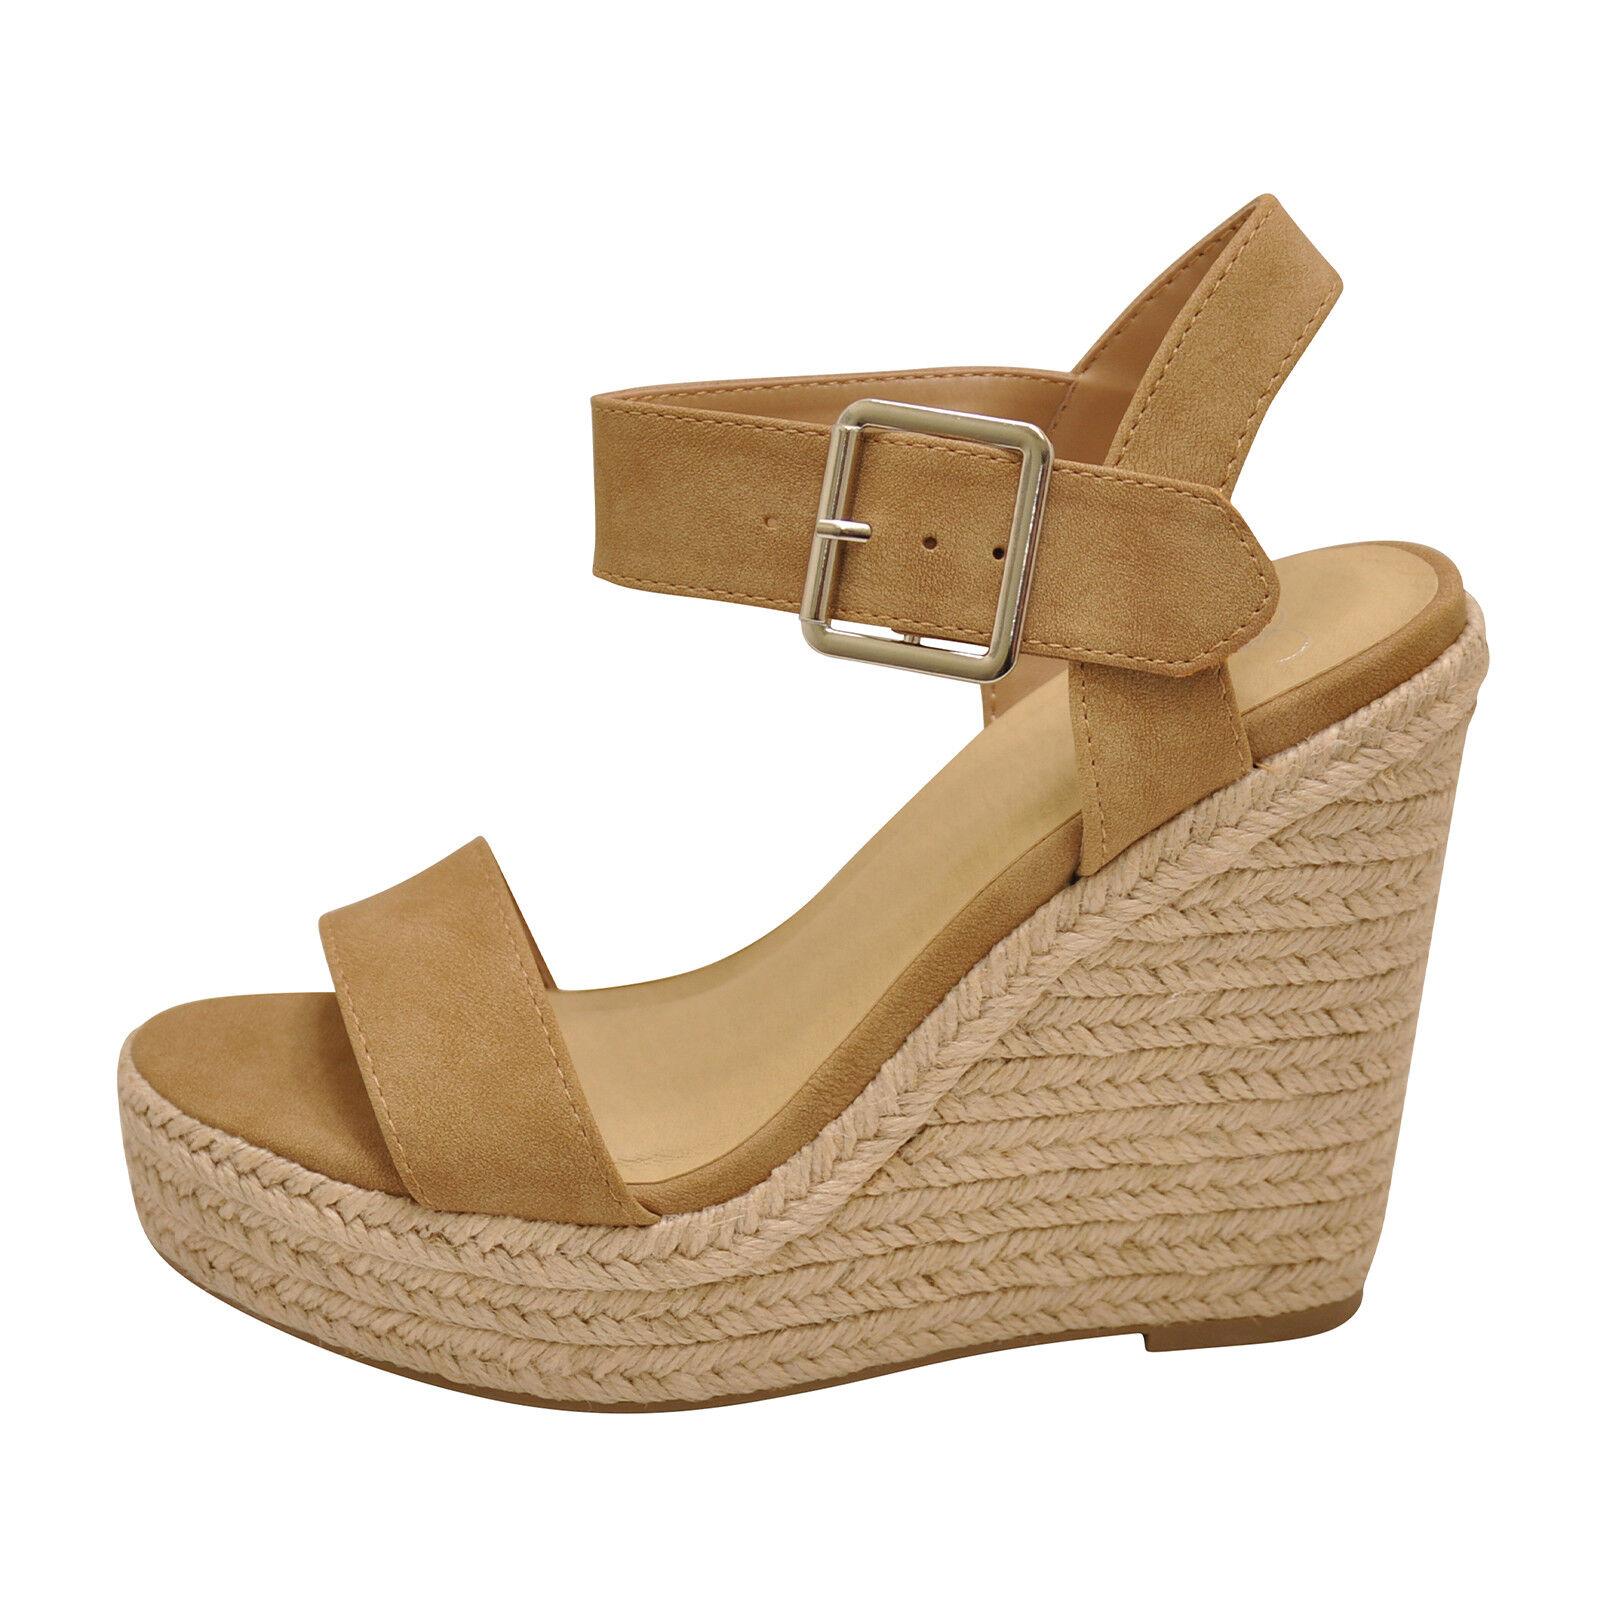 Delicious BURST Camel Women's Platform Wedge Espadrille Sandals